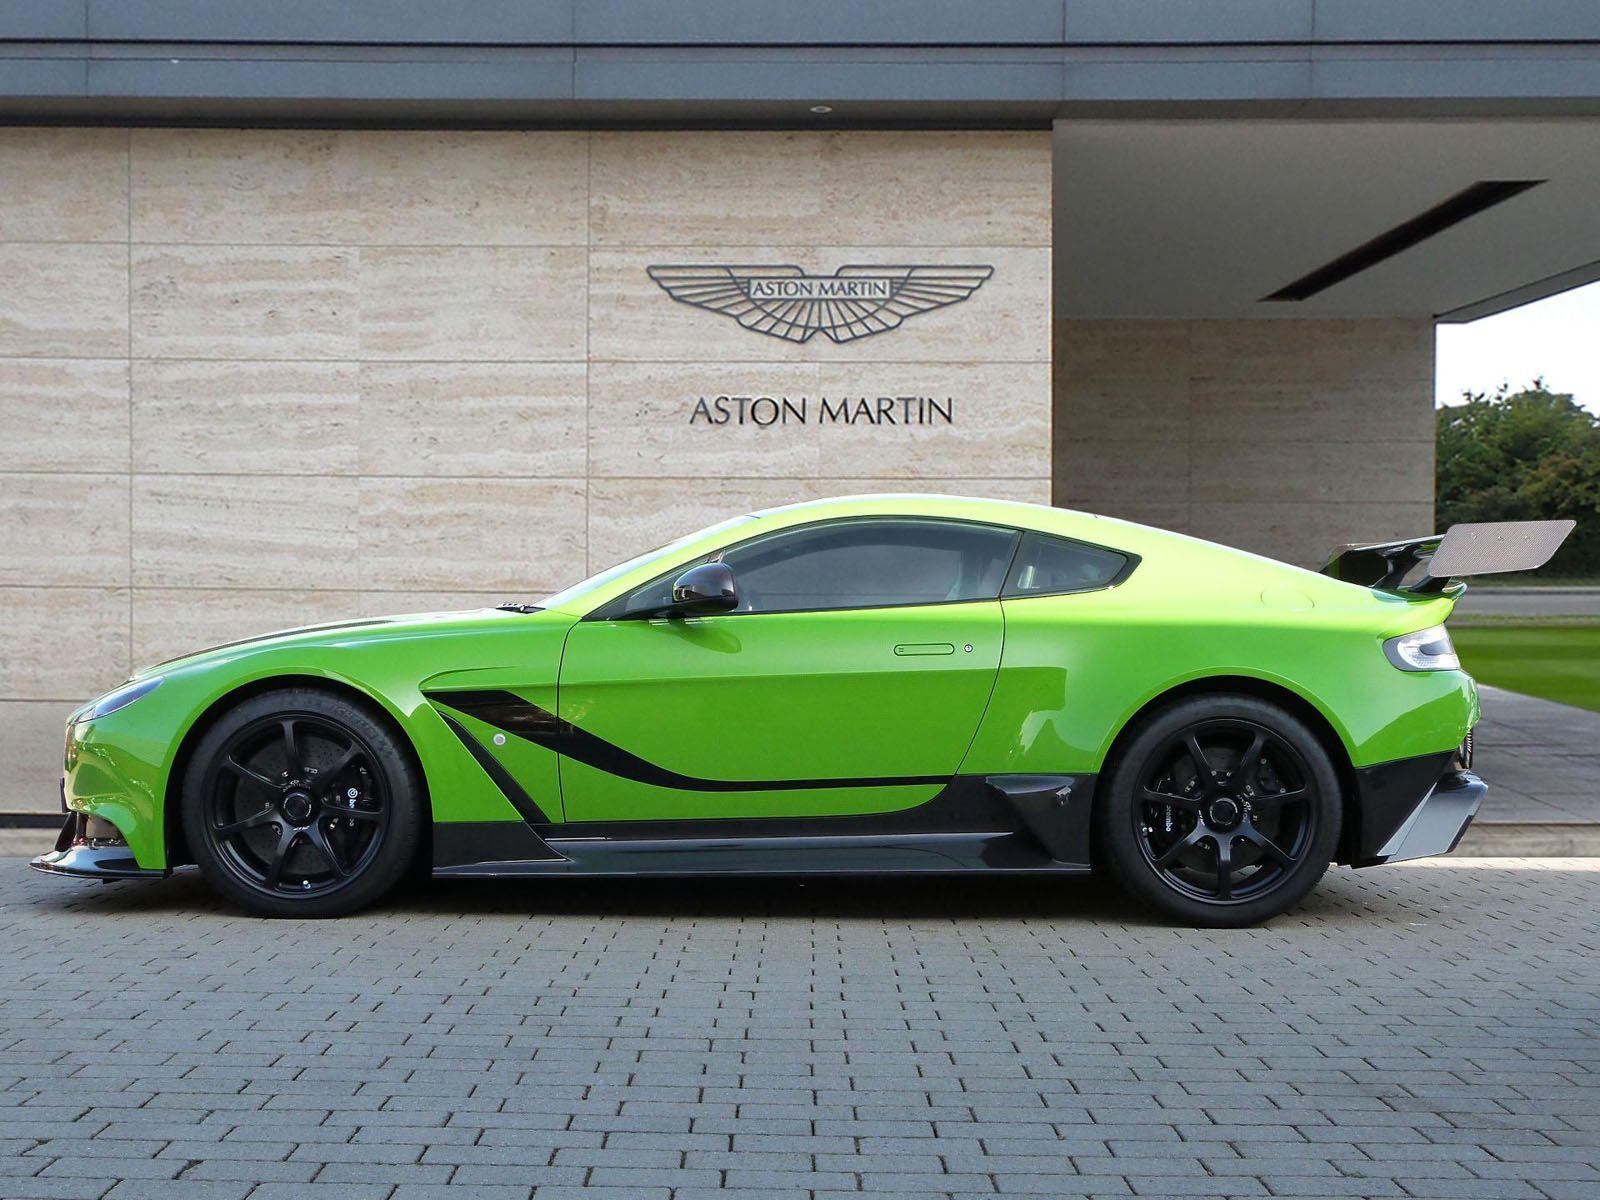 One Uk Dealer Has Two Aston Martin Vantage Gt12s For Sale Carscoops Aston Martin Aston Martin Vantage Aston